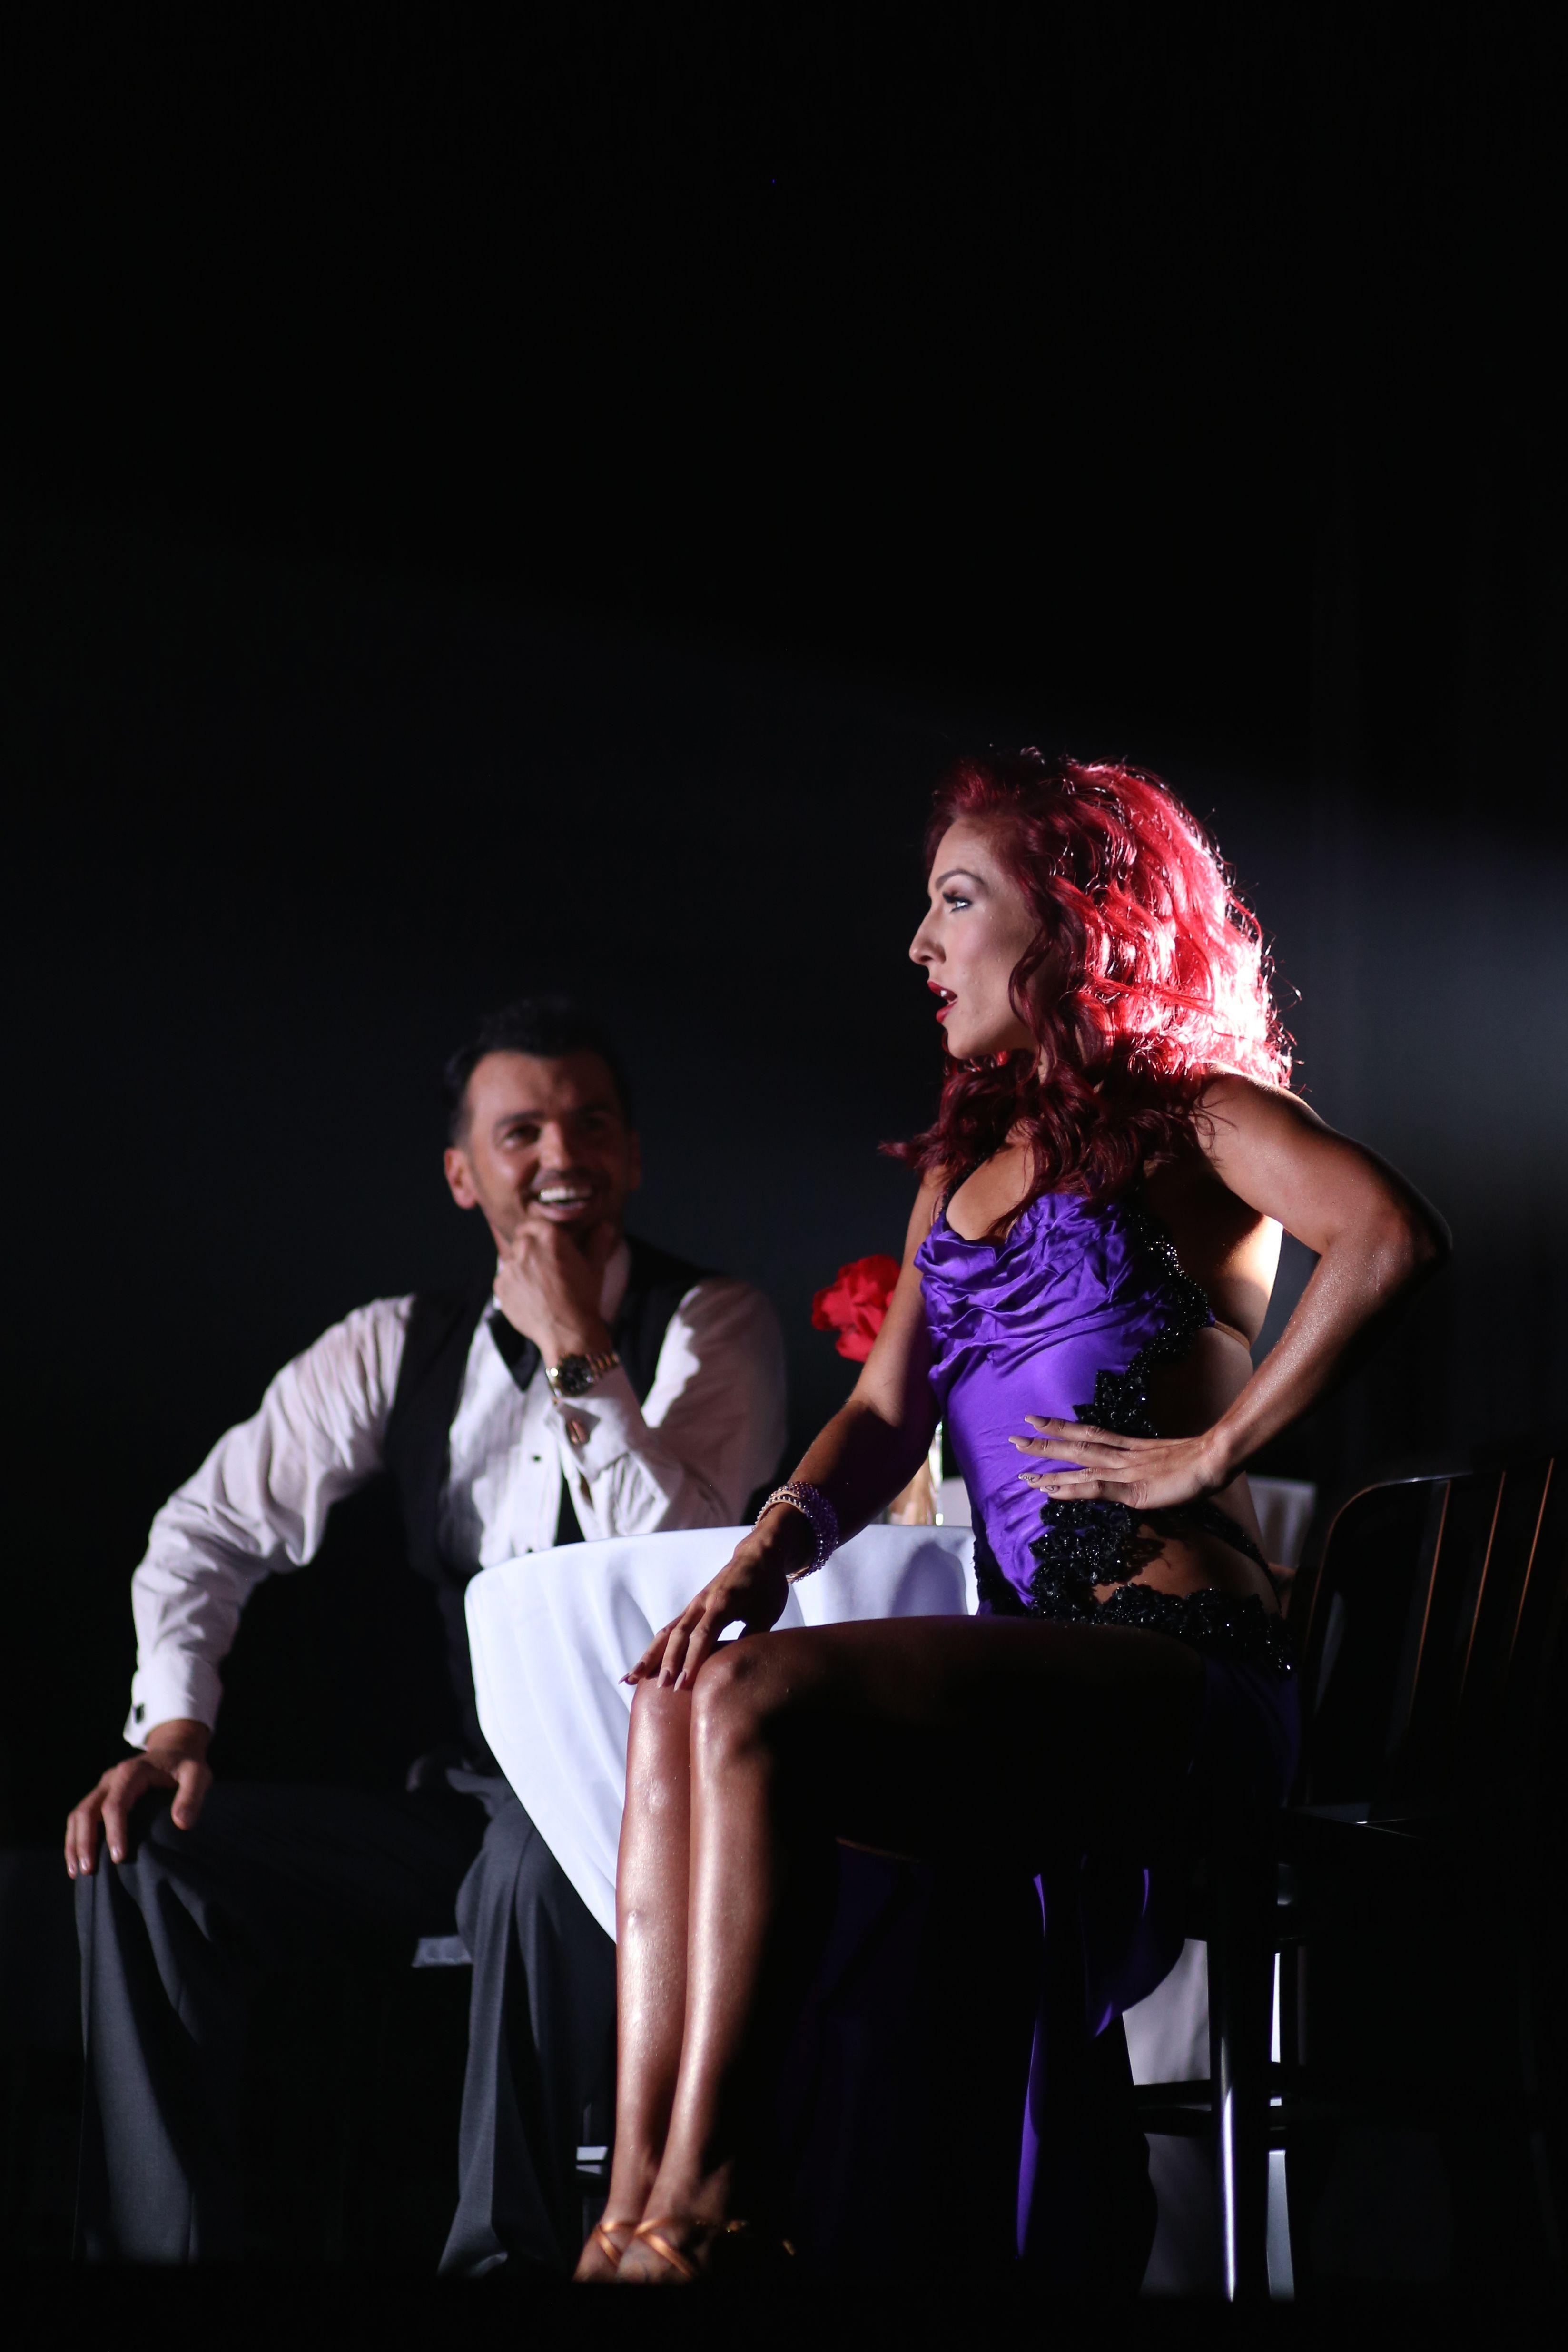 dating ballroom dans den mest interessante mannen i verden på Speed dating